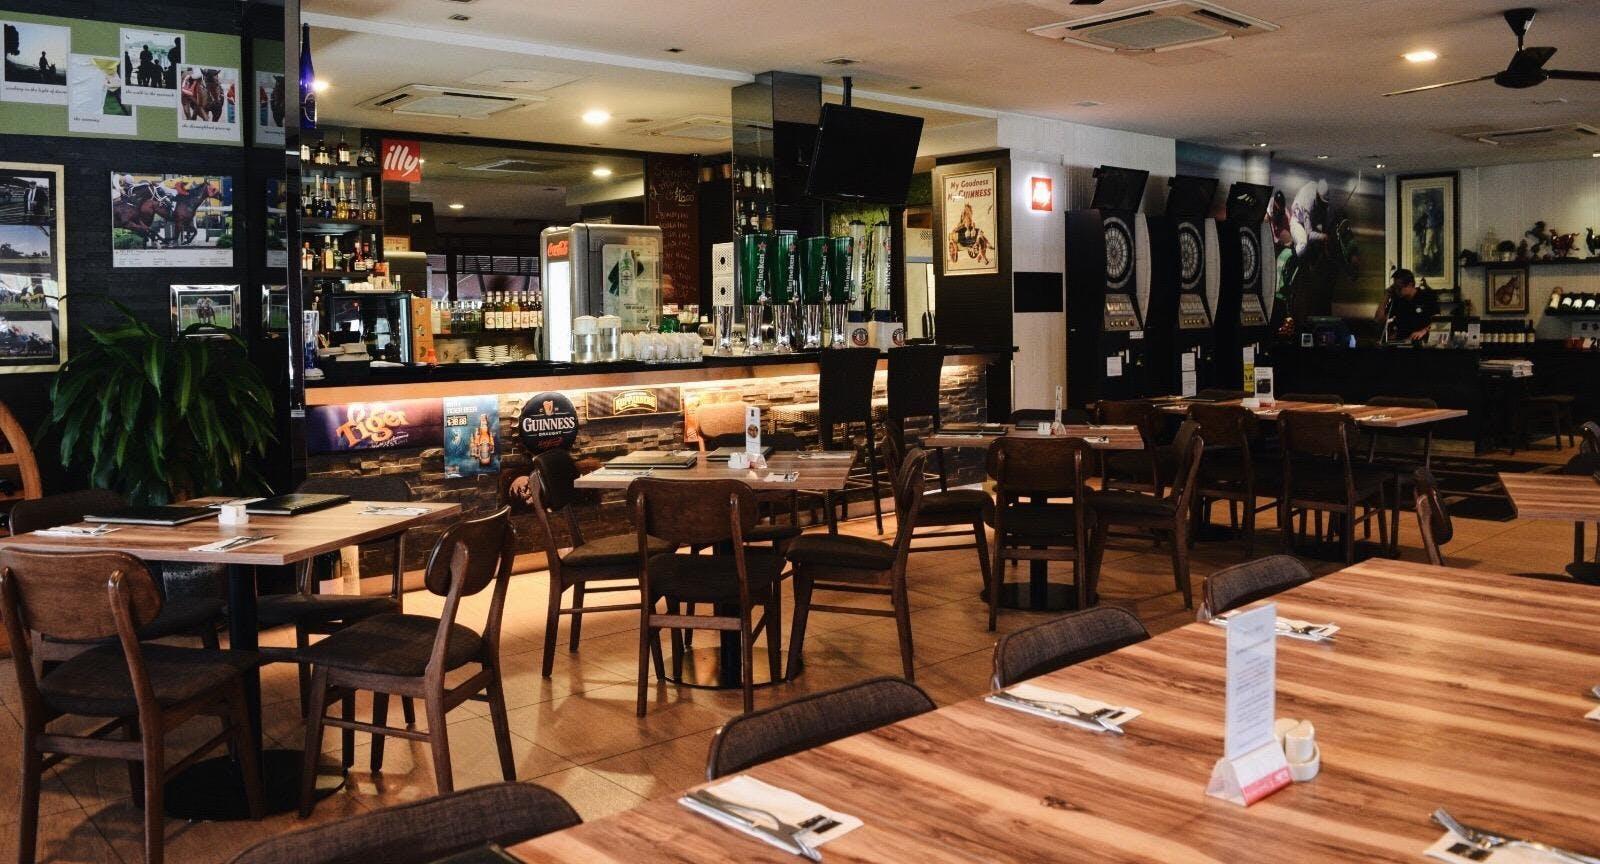 Cheval Cafe Bar Bistro Singapore image 2